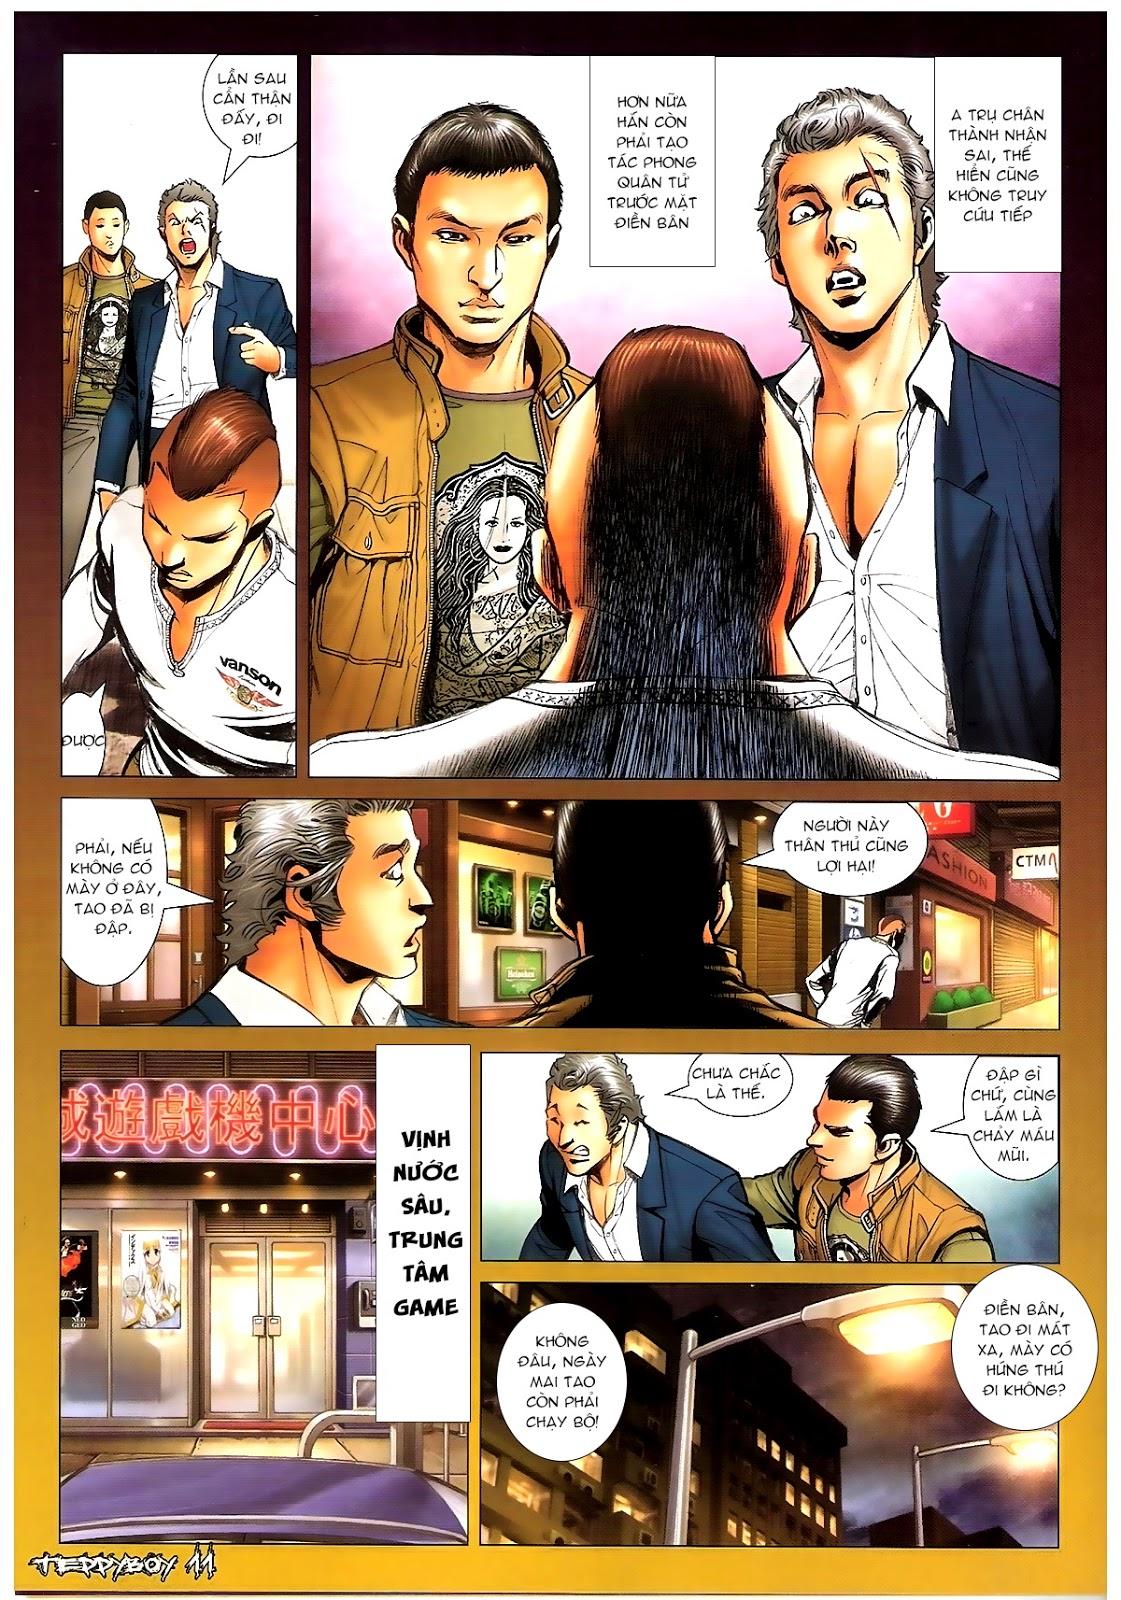 Người Trong Giang Hồ - Chapter 1378: Oan gia gặp nhau - Pic 10